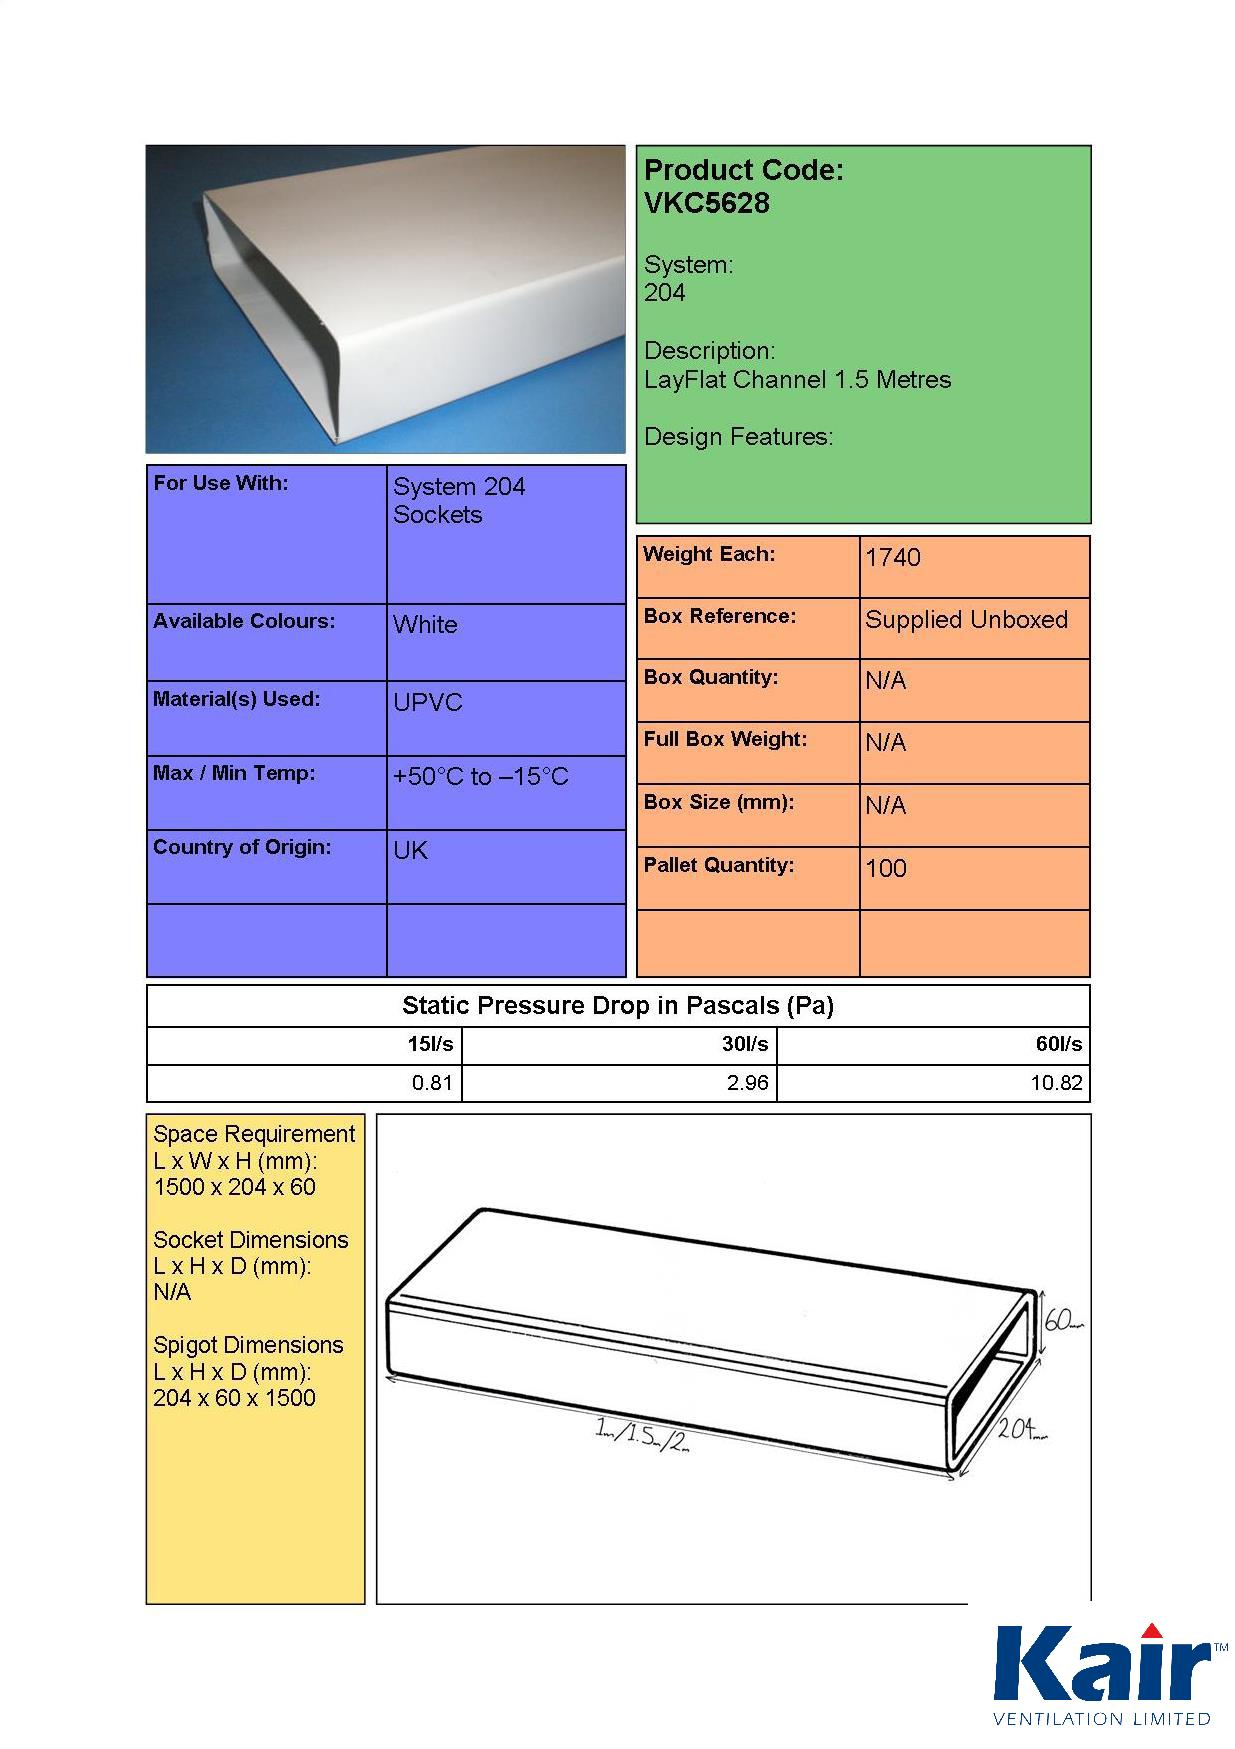 System 204 Flat Channel 1.5 Metre